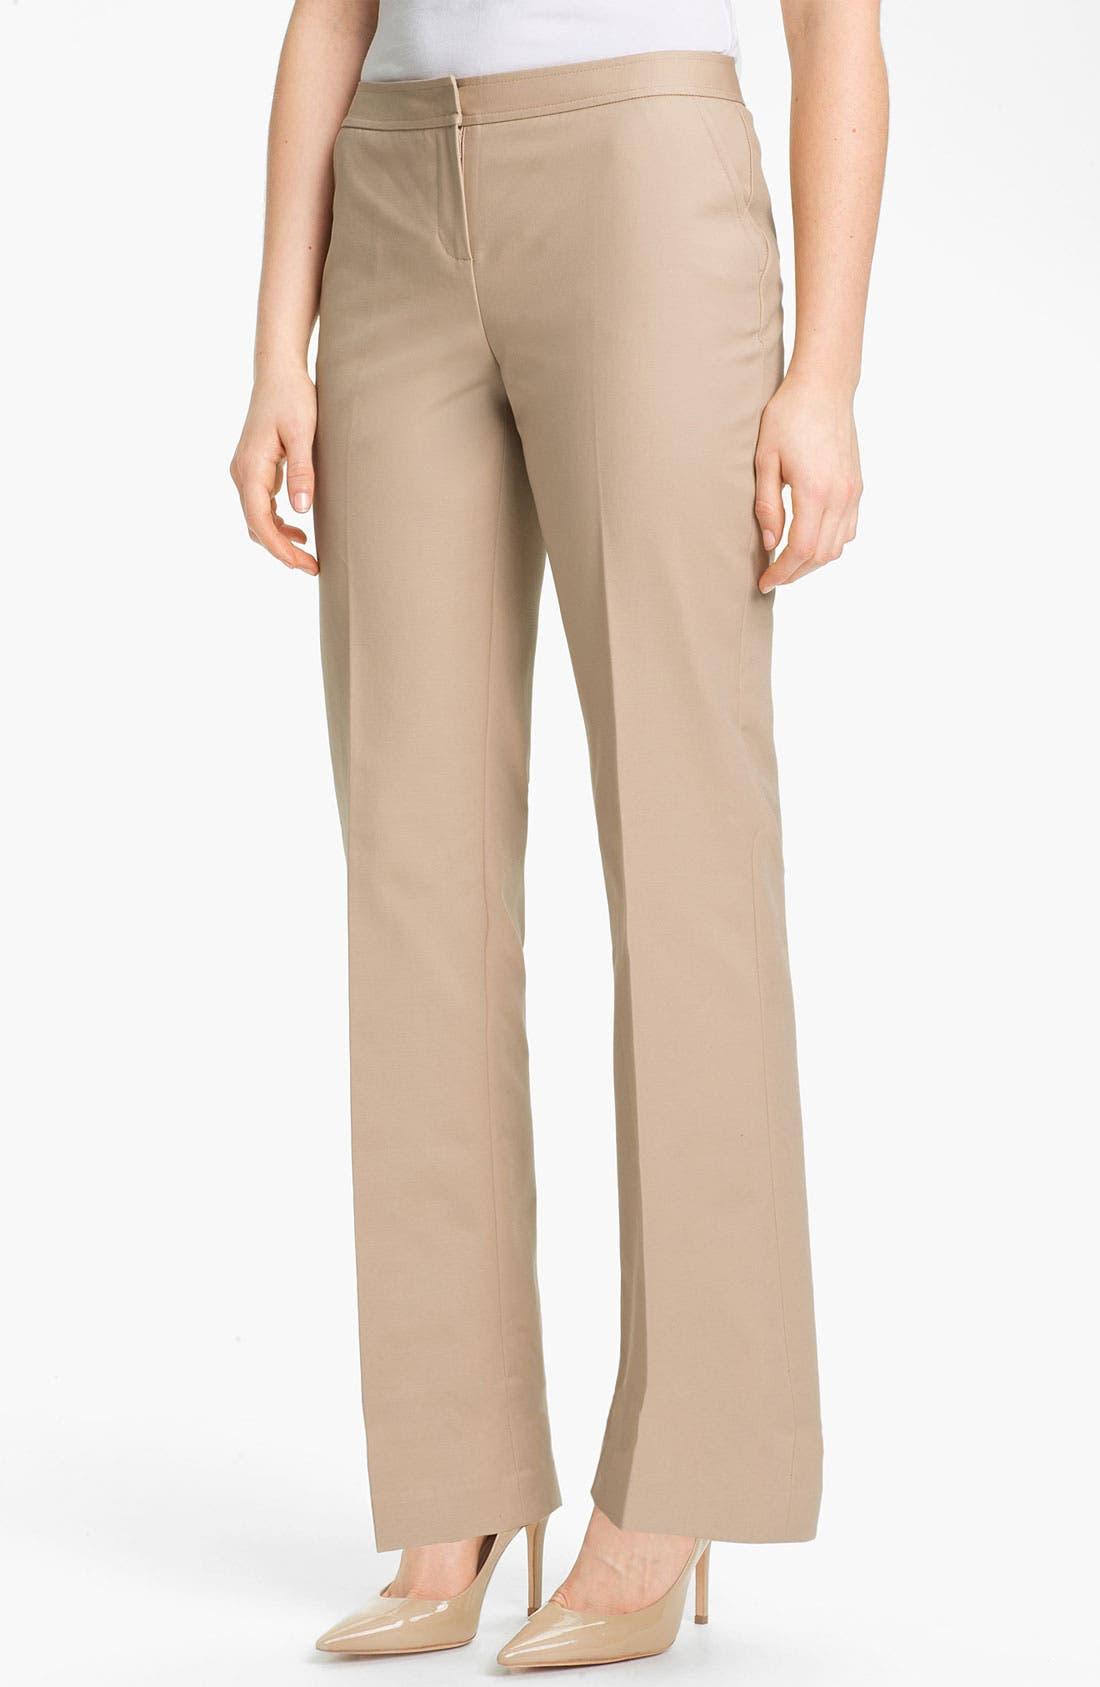 Alternate Image 1 Selected - Halogen® 'Taylor' Curvy Fit Stretch Cotton Blend Pants (Petite)